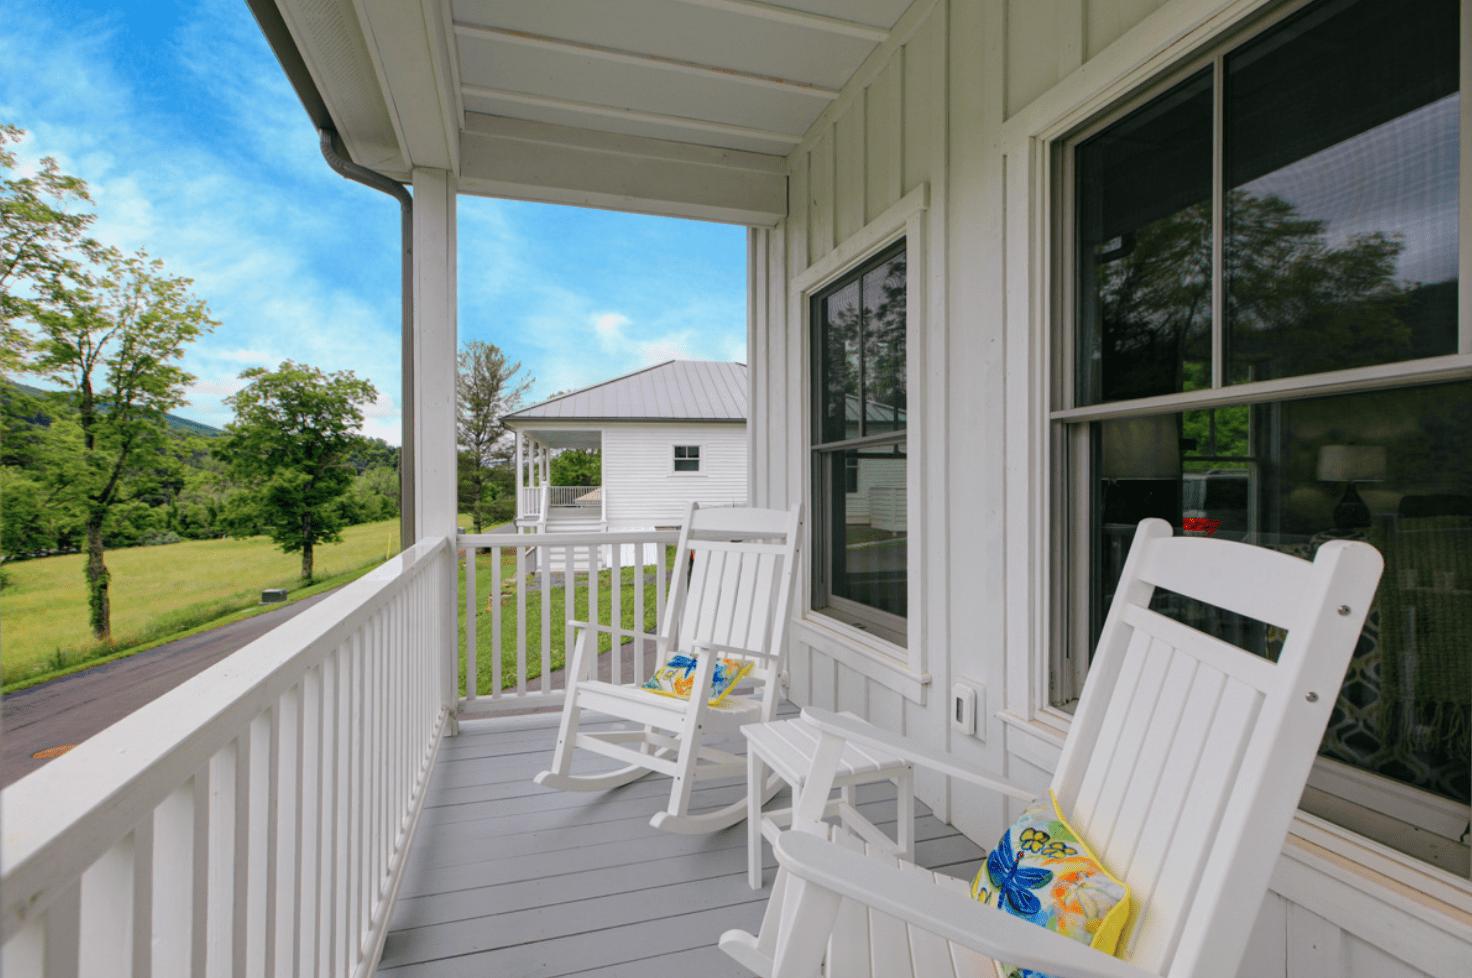 white rocking chairs sitting on white porch